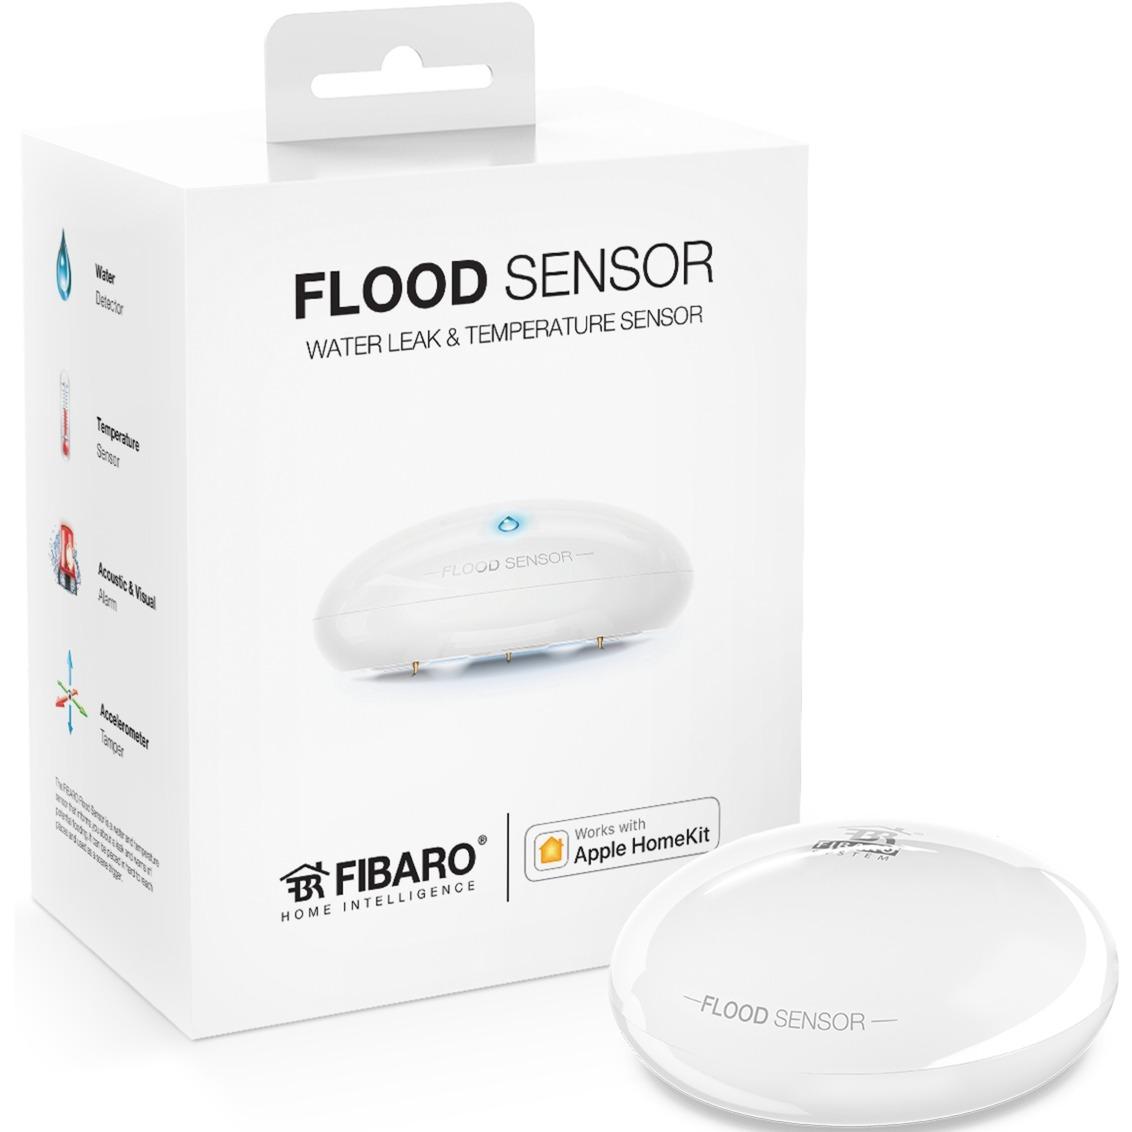 FGBHFS-101 mulltisensor smart home Inalámbrico Bluetooth